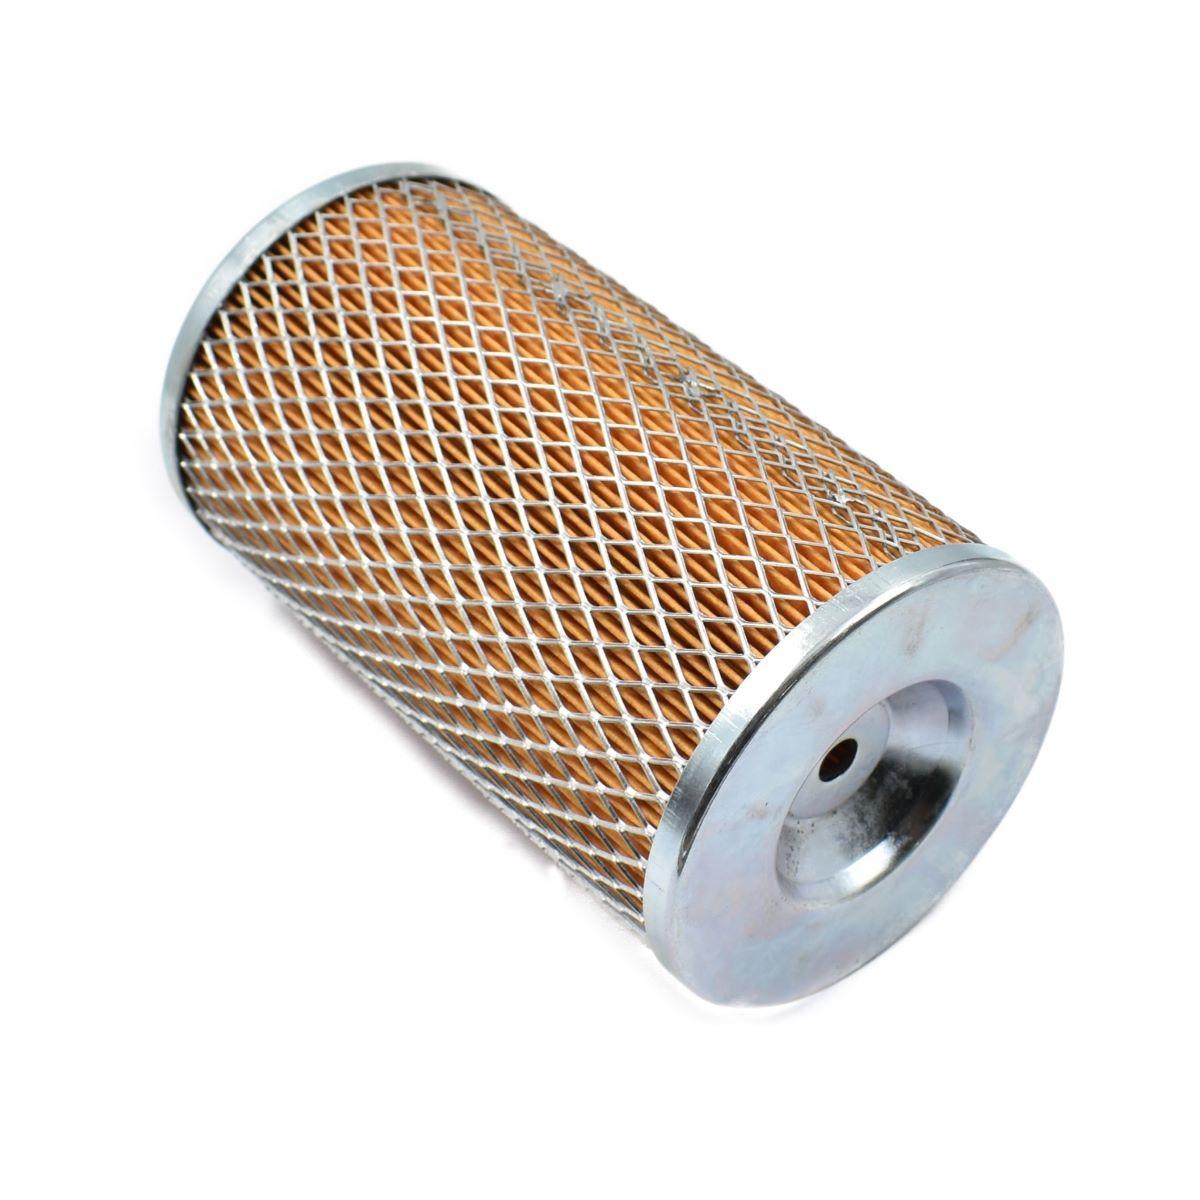 1427-101-014-00 / 1427-101-0140-0 / 142710101400 Iseki: TX1000 TX1300 TX1500 Iseki: (Afhankelijk van serie nr) TX1210 TX1410 TX1510 Afmetingen: Lengte: 171mm Diameter: 93,50mm Diameter gat: 8 / 46 mm